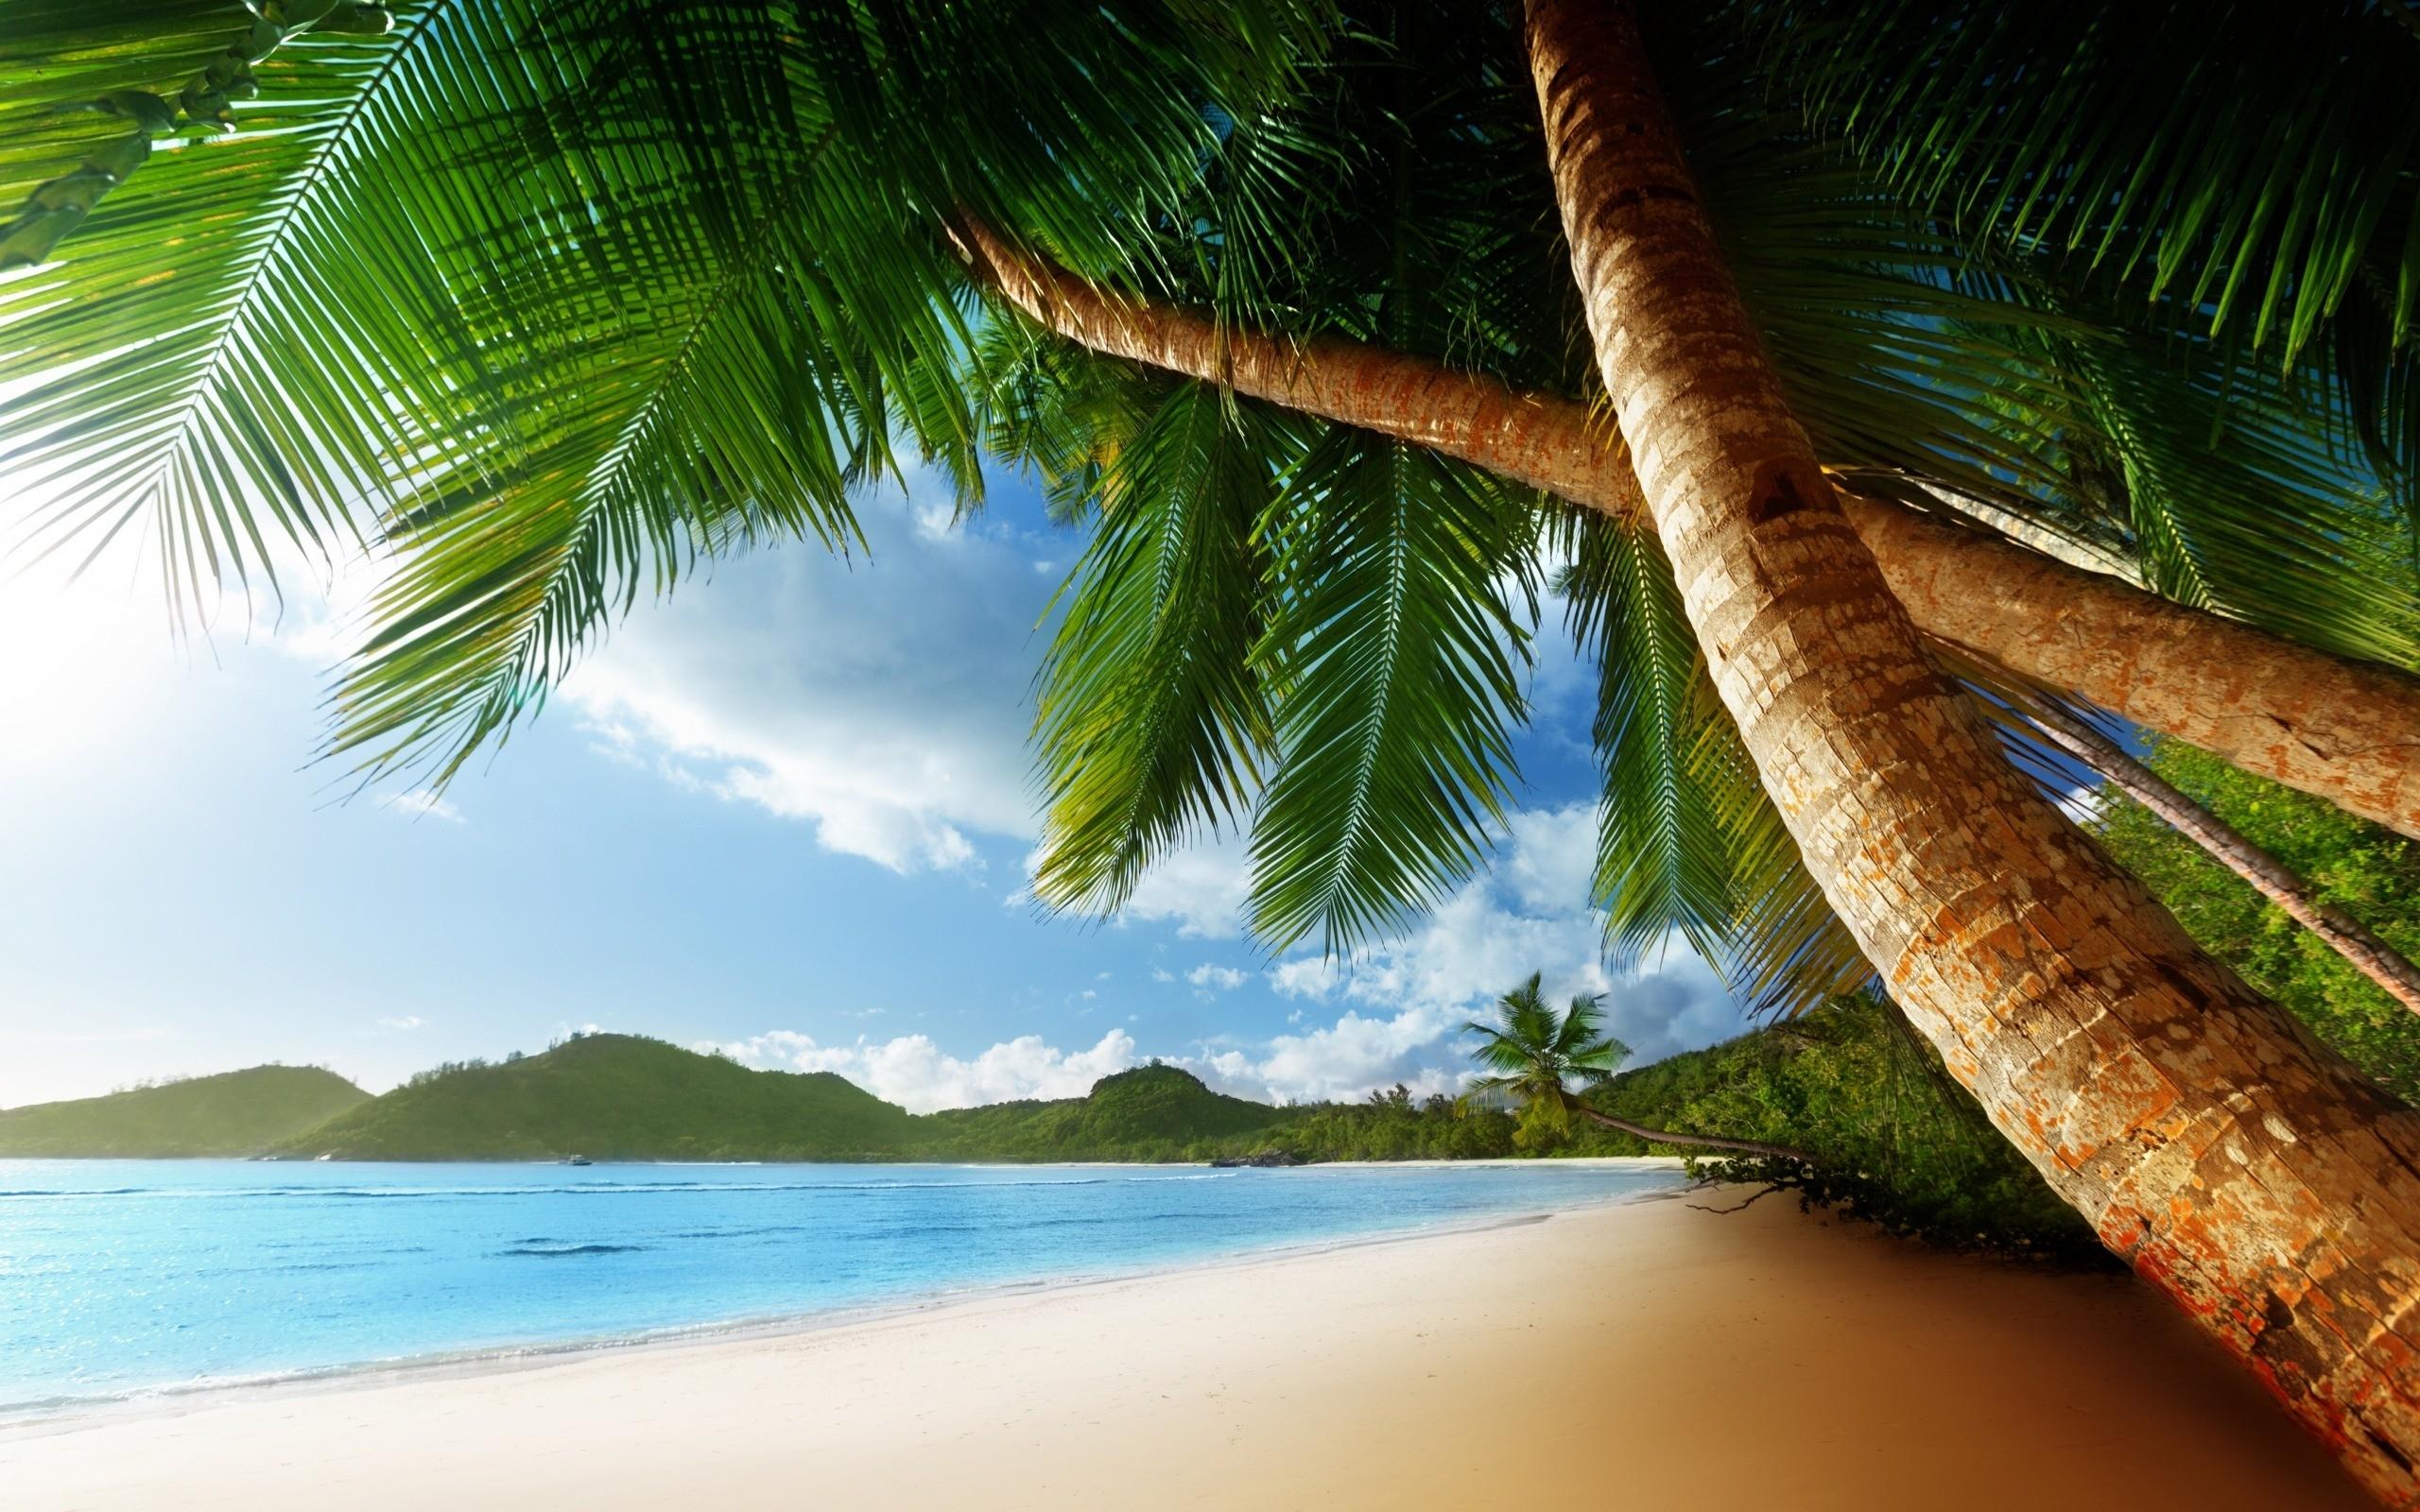 palm tree background 22011 2560x1600 px ~ hdwallsource